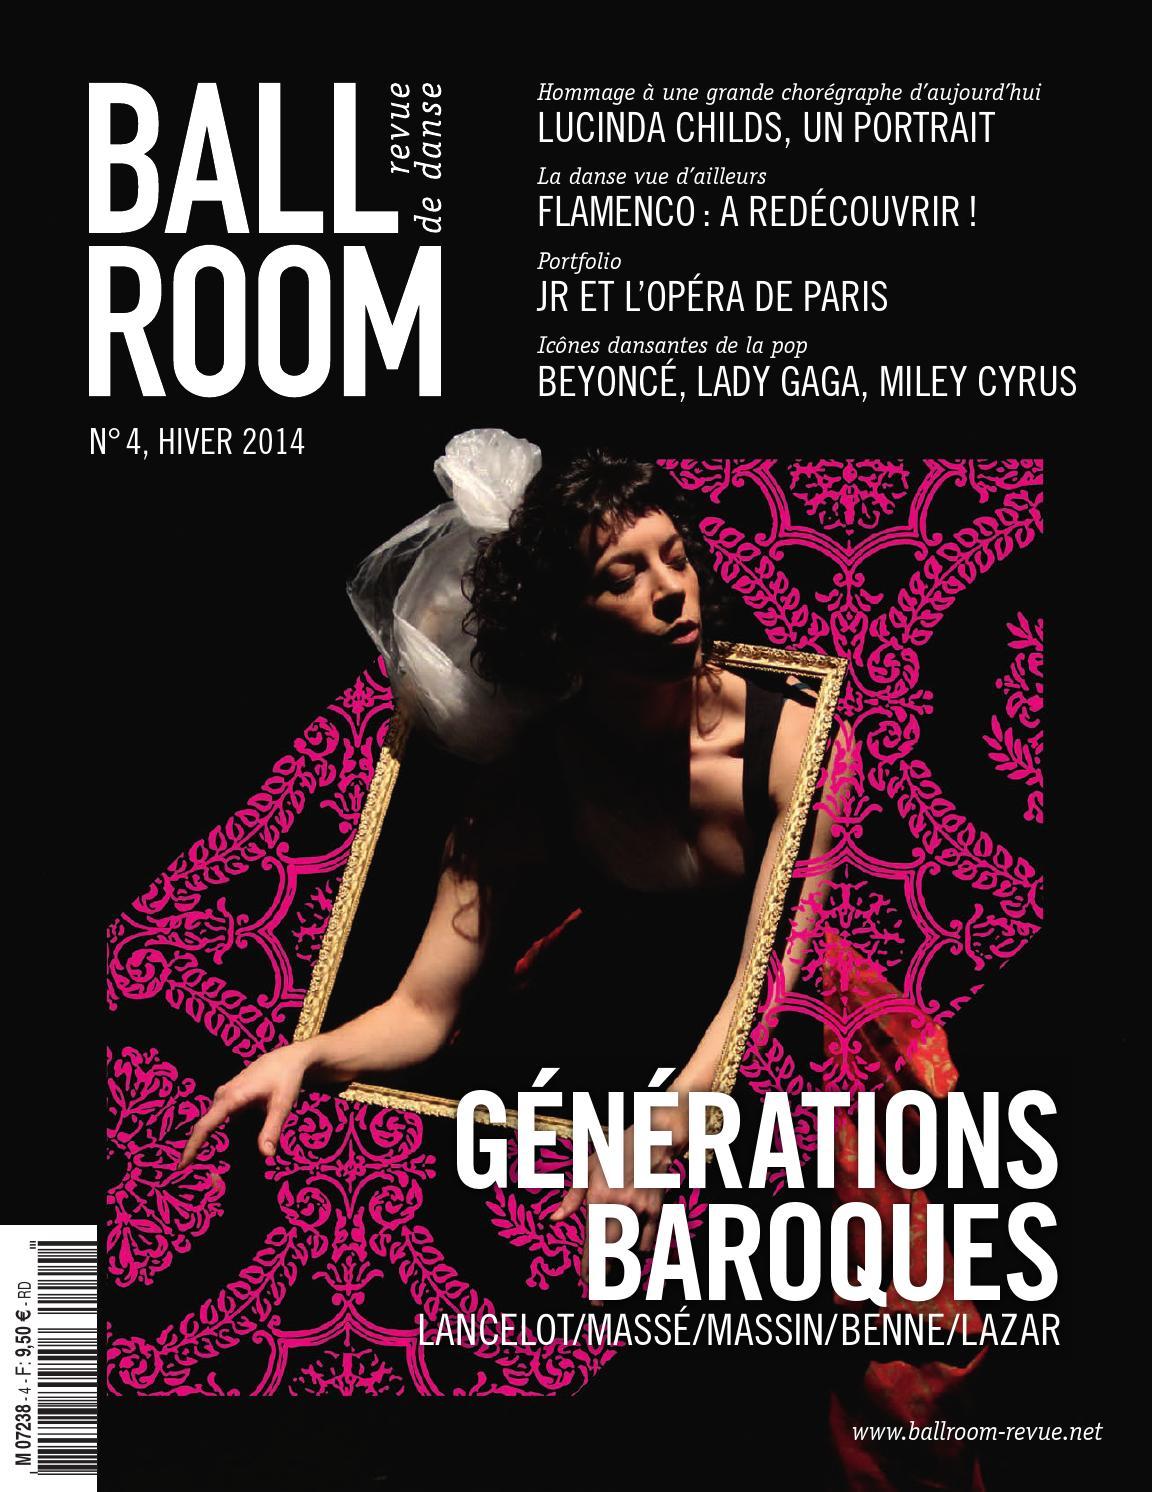 Ballroom revue numéro 4 by Olivier - issuu a1d53ee5c1e1